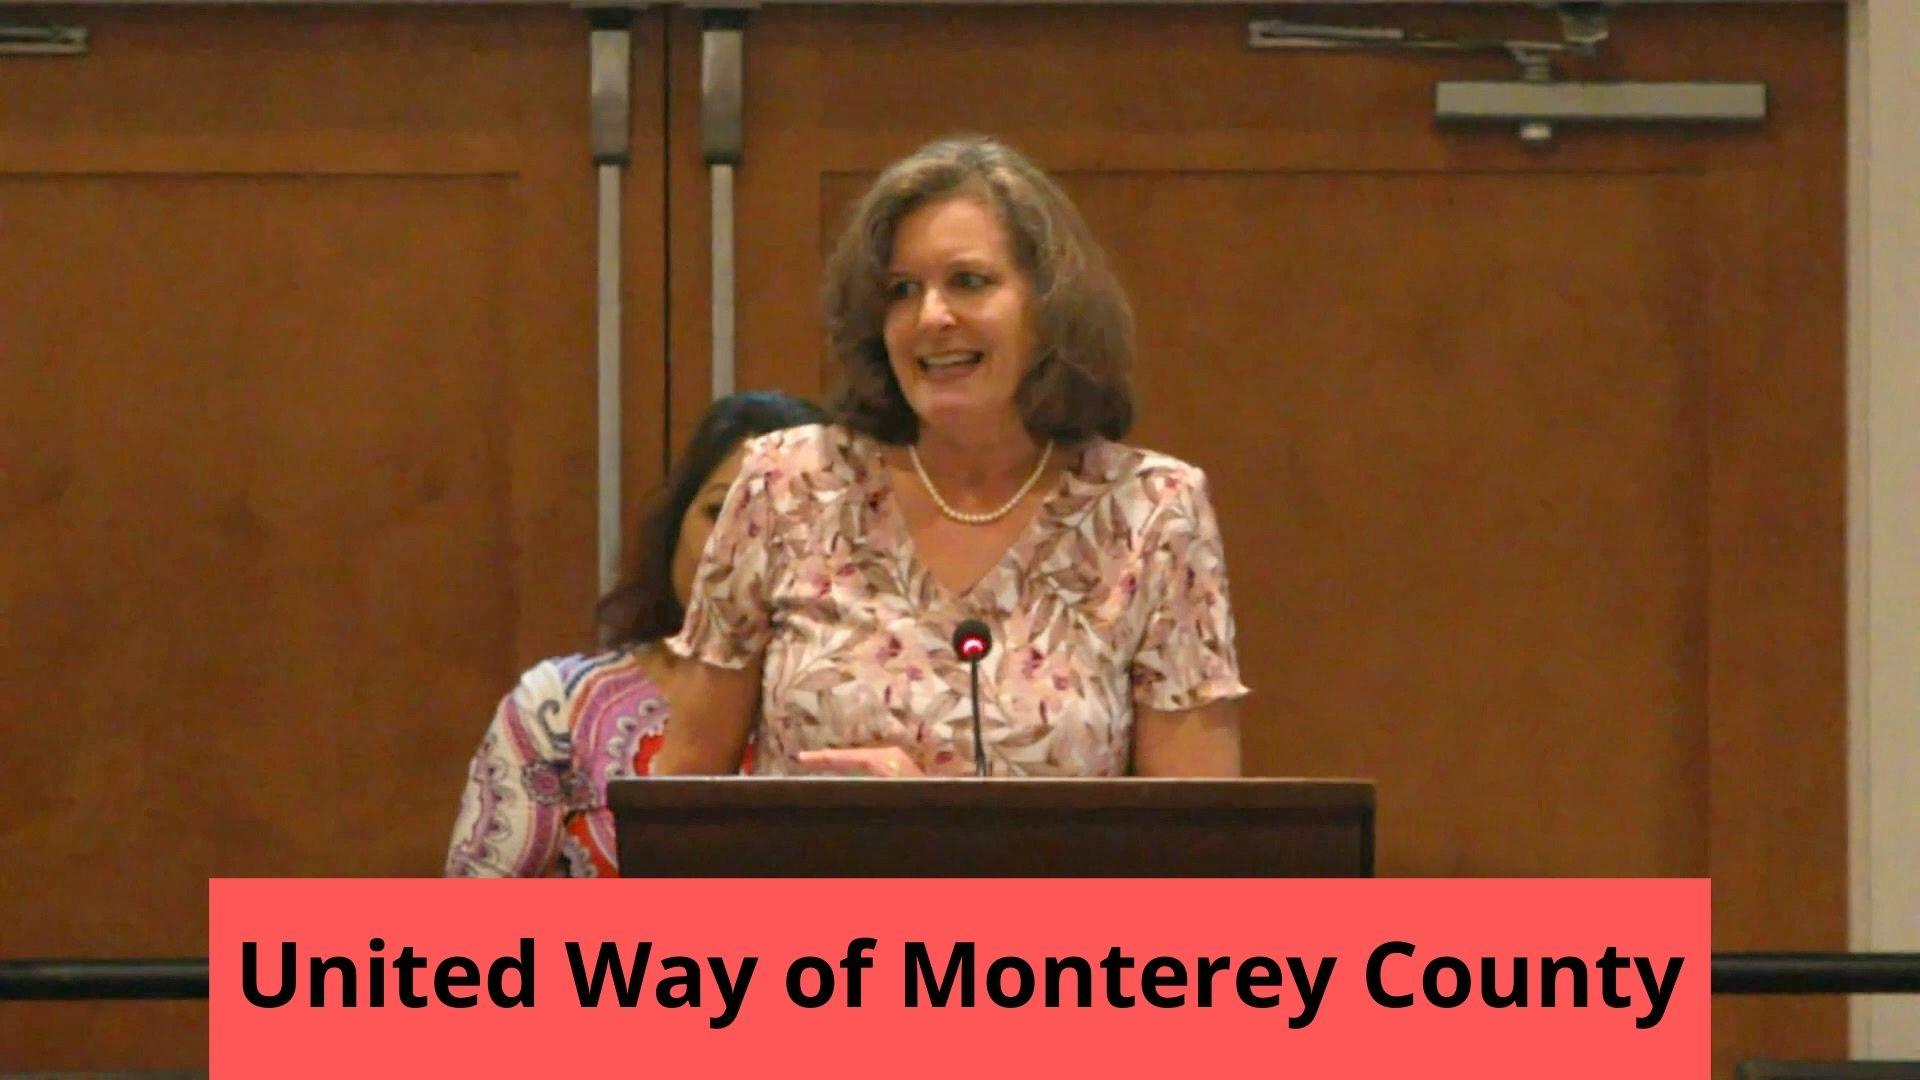 United Way of Monterey County